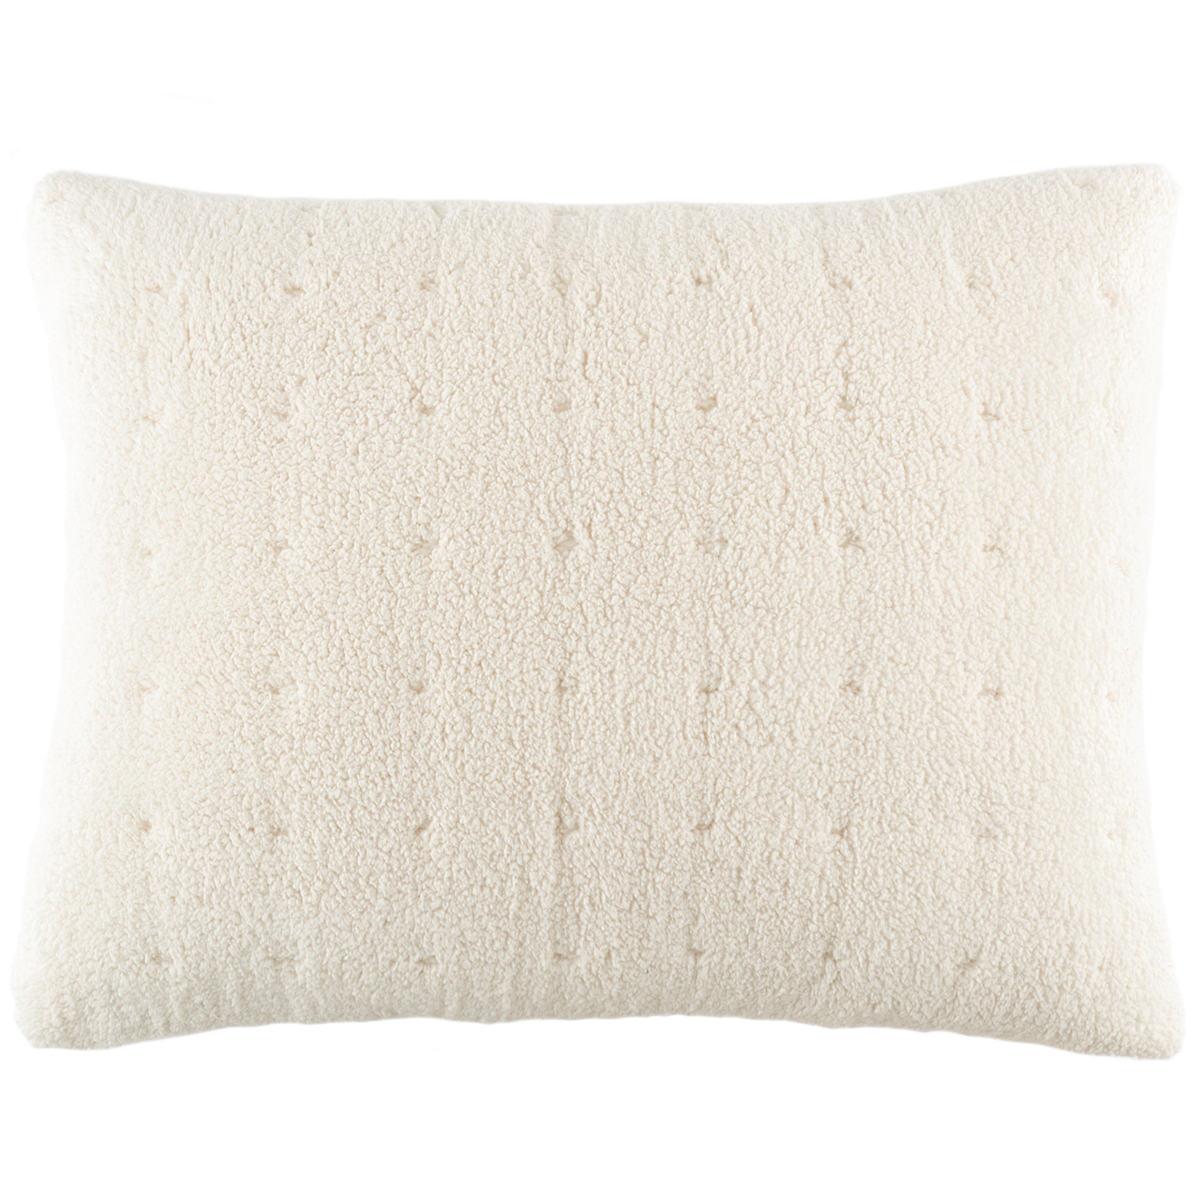 Marshmallow Fleece Ivory Decorative Pillow